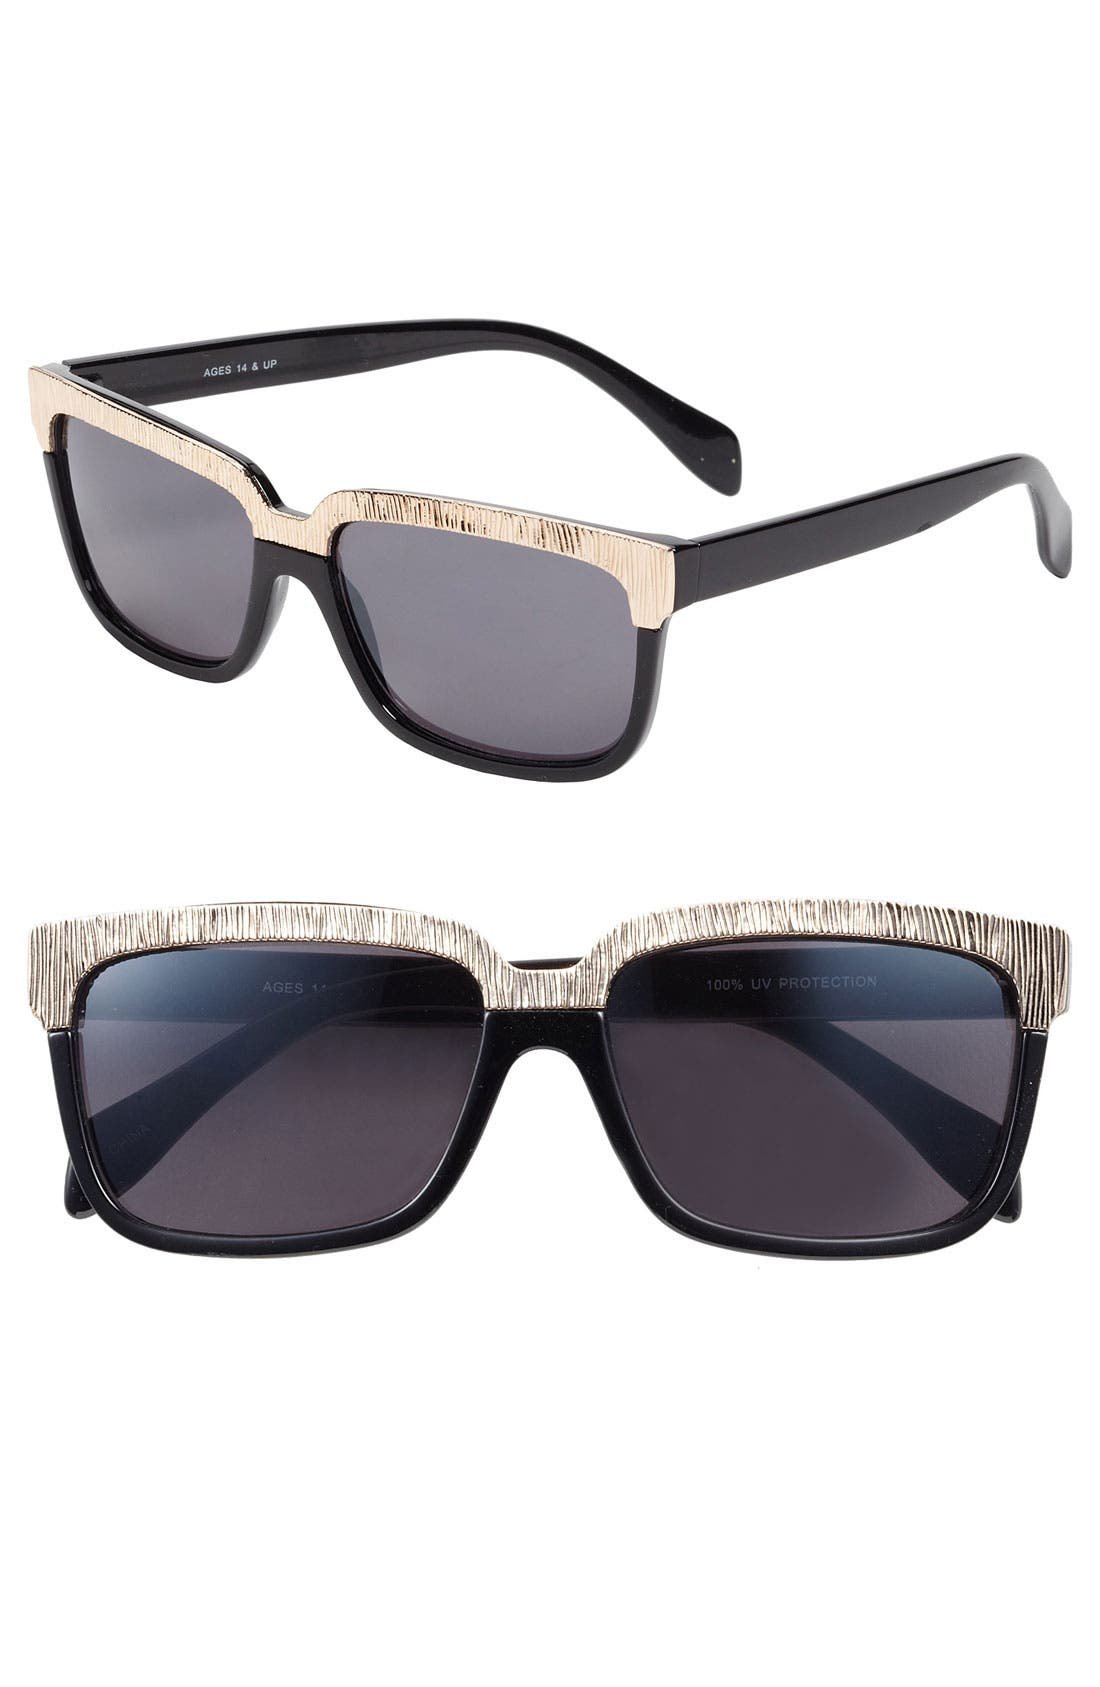 Main Image - Fantas Eyes Leopard Trim Sunglasses